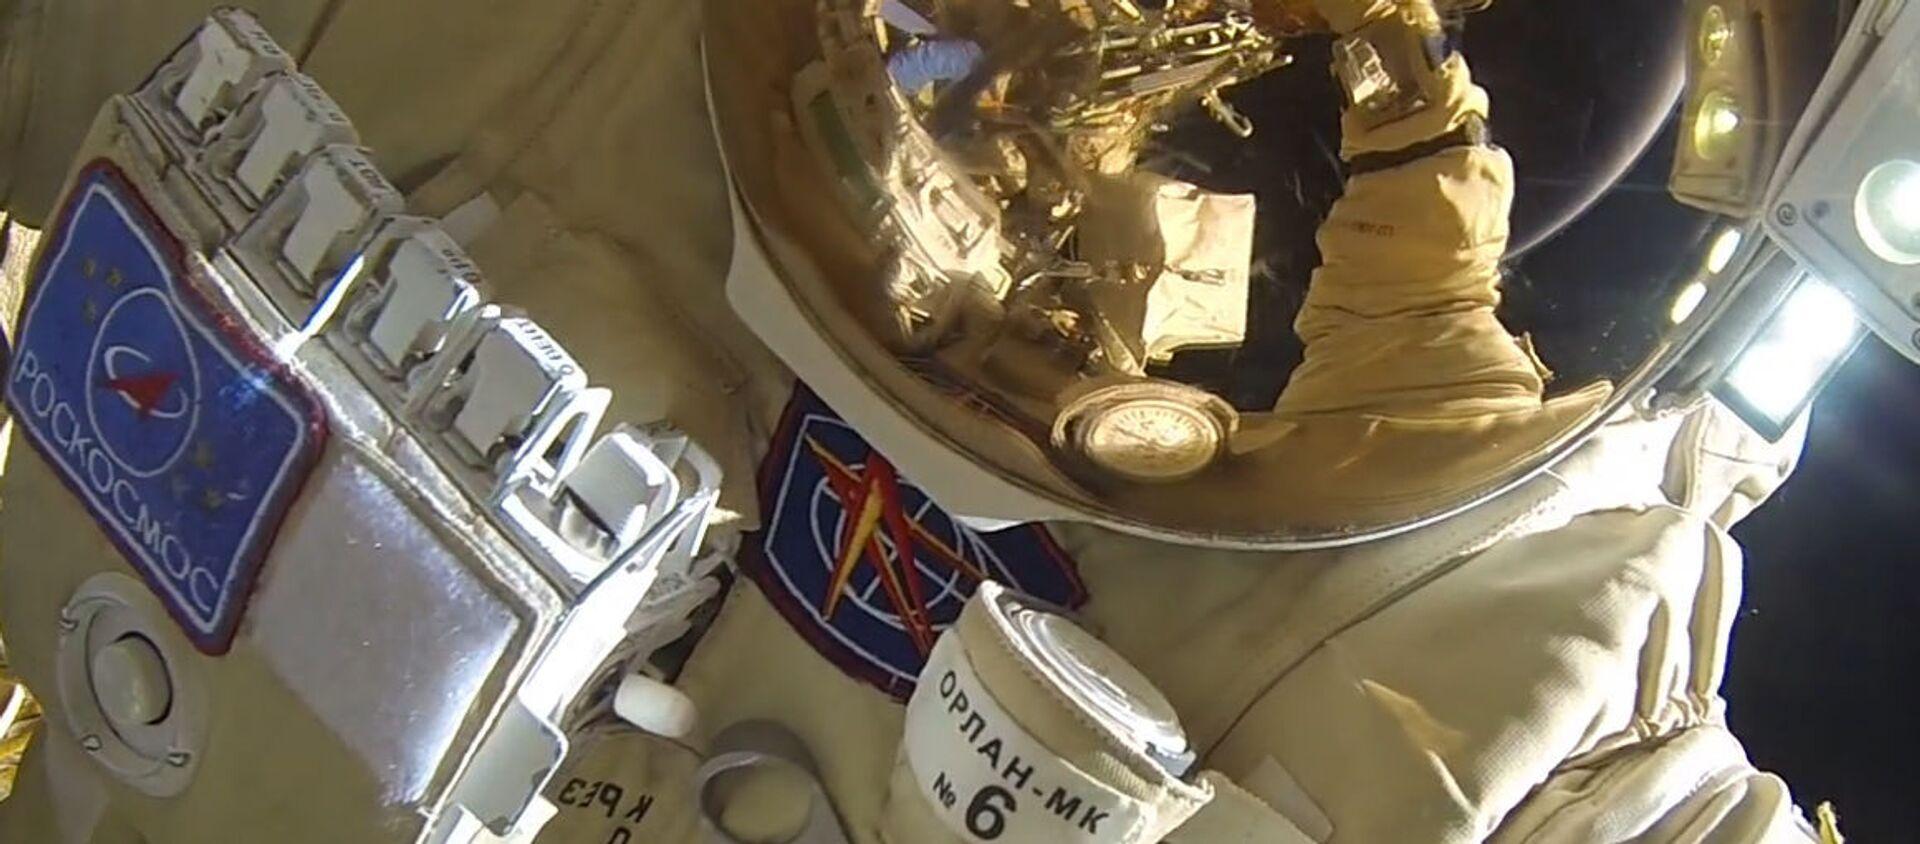 Un cosmonauta (imagen referencial) - Sputnik Mundo, 1920, 31.12.2019